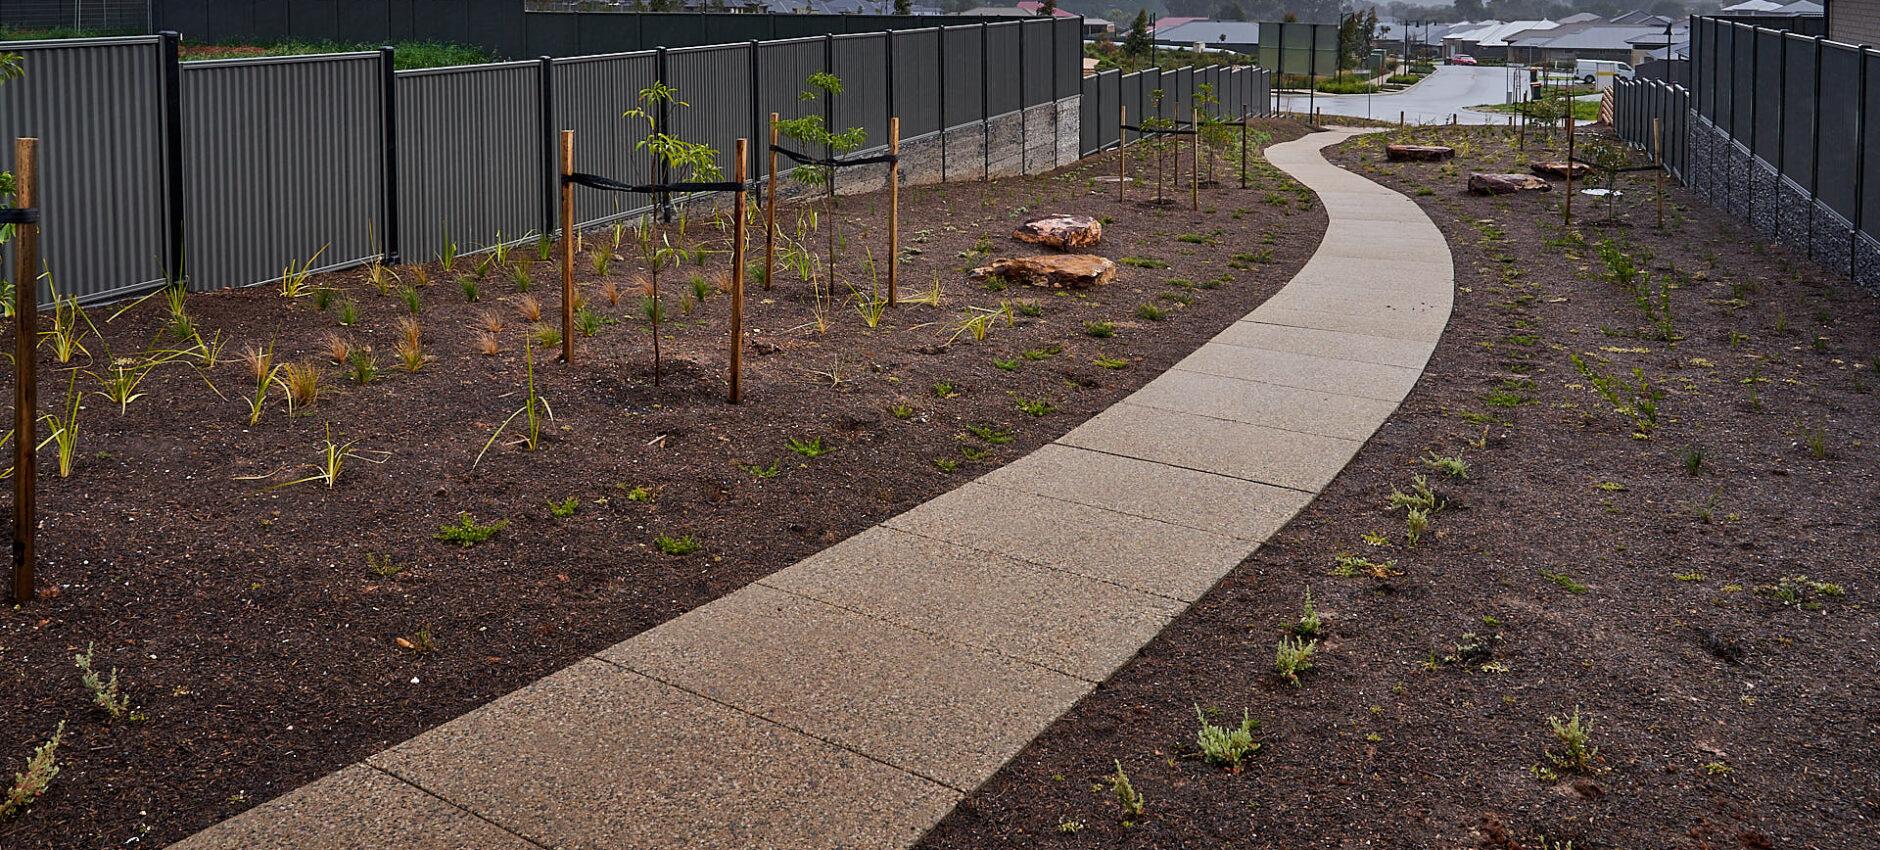 Space-Landscape_Springwood-Estate-Linear-Path_Jul2020_0044_LoRes.jpg